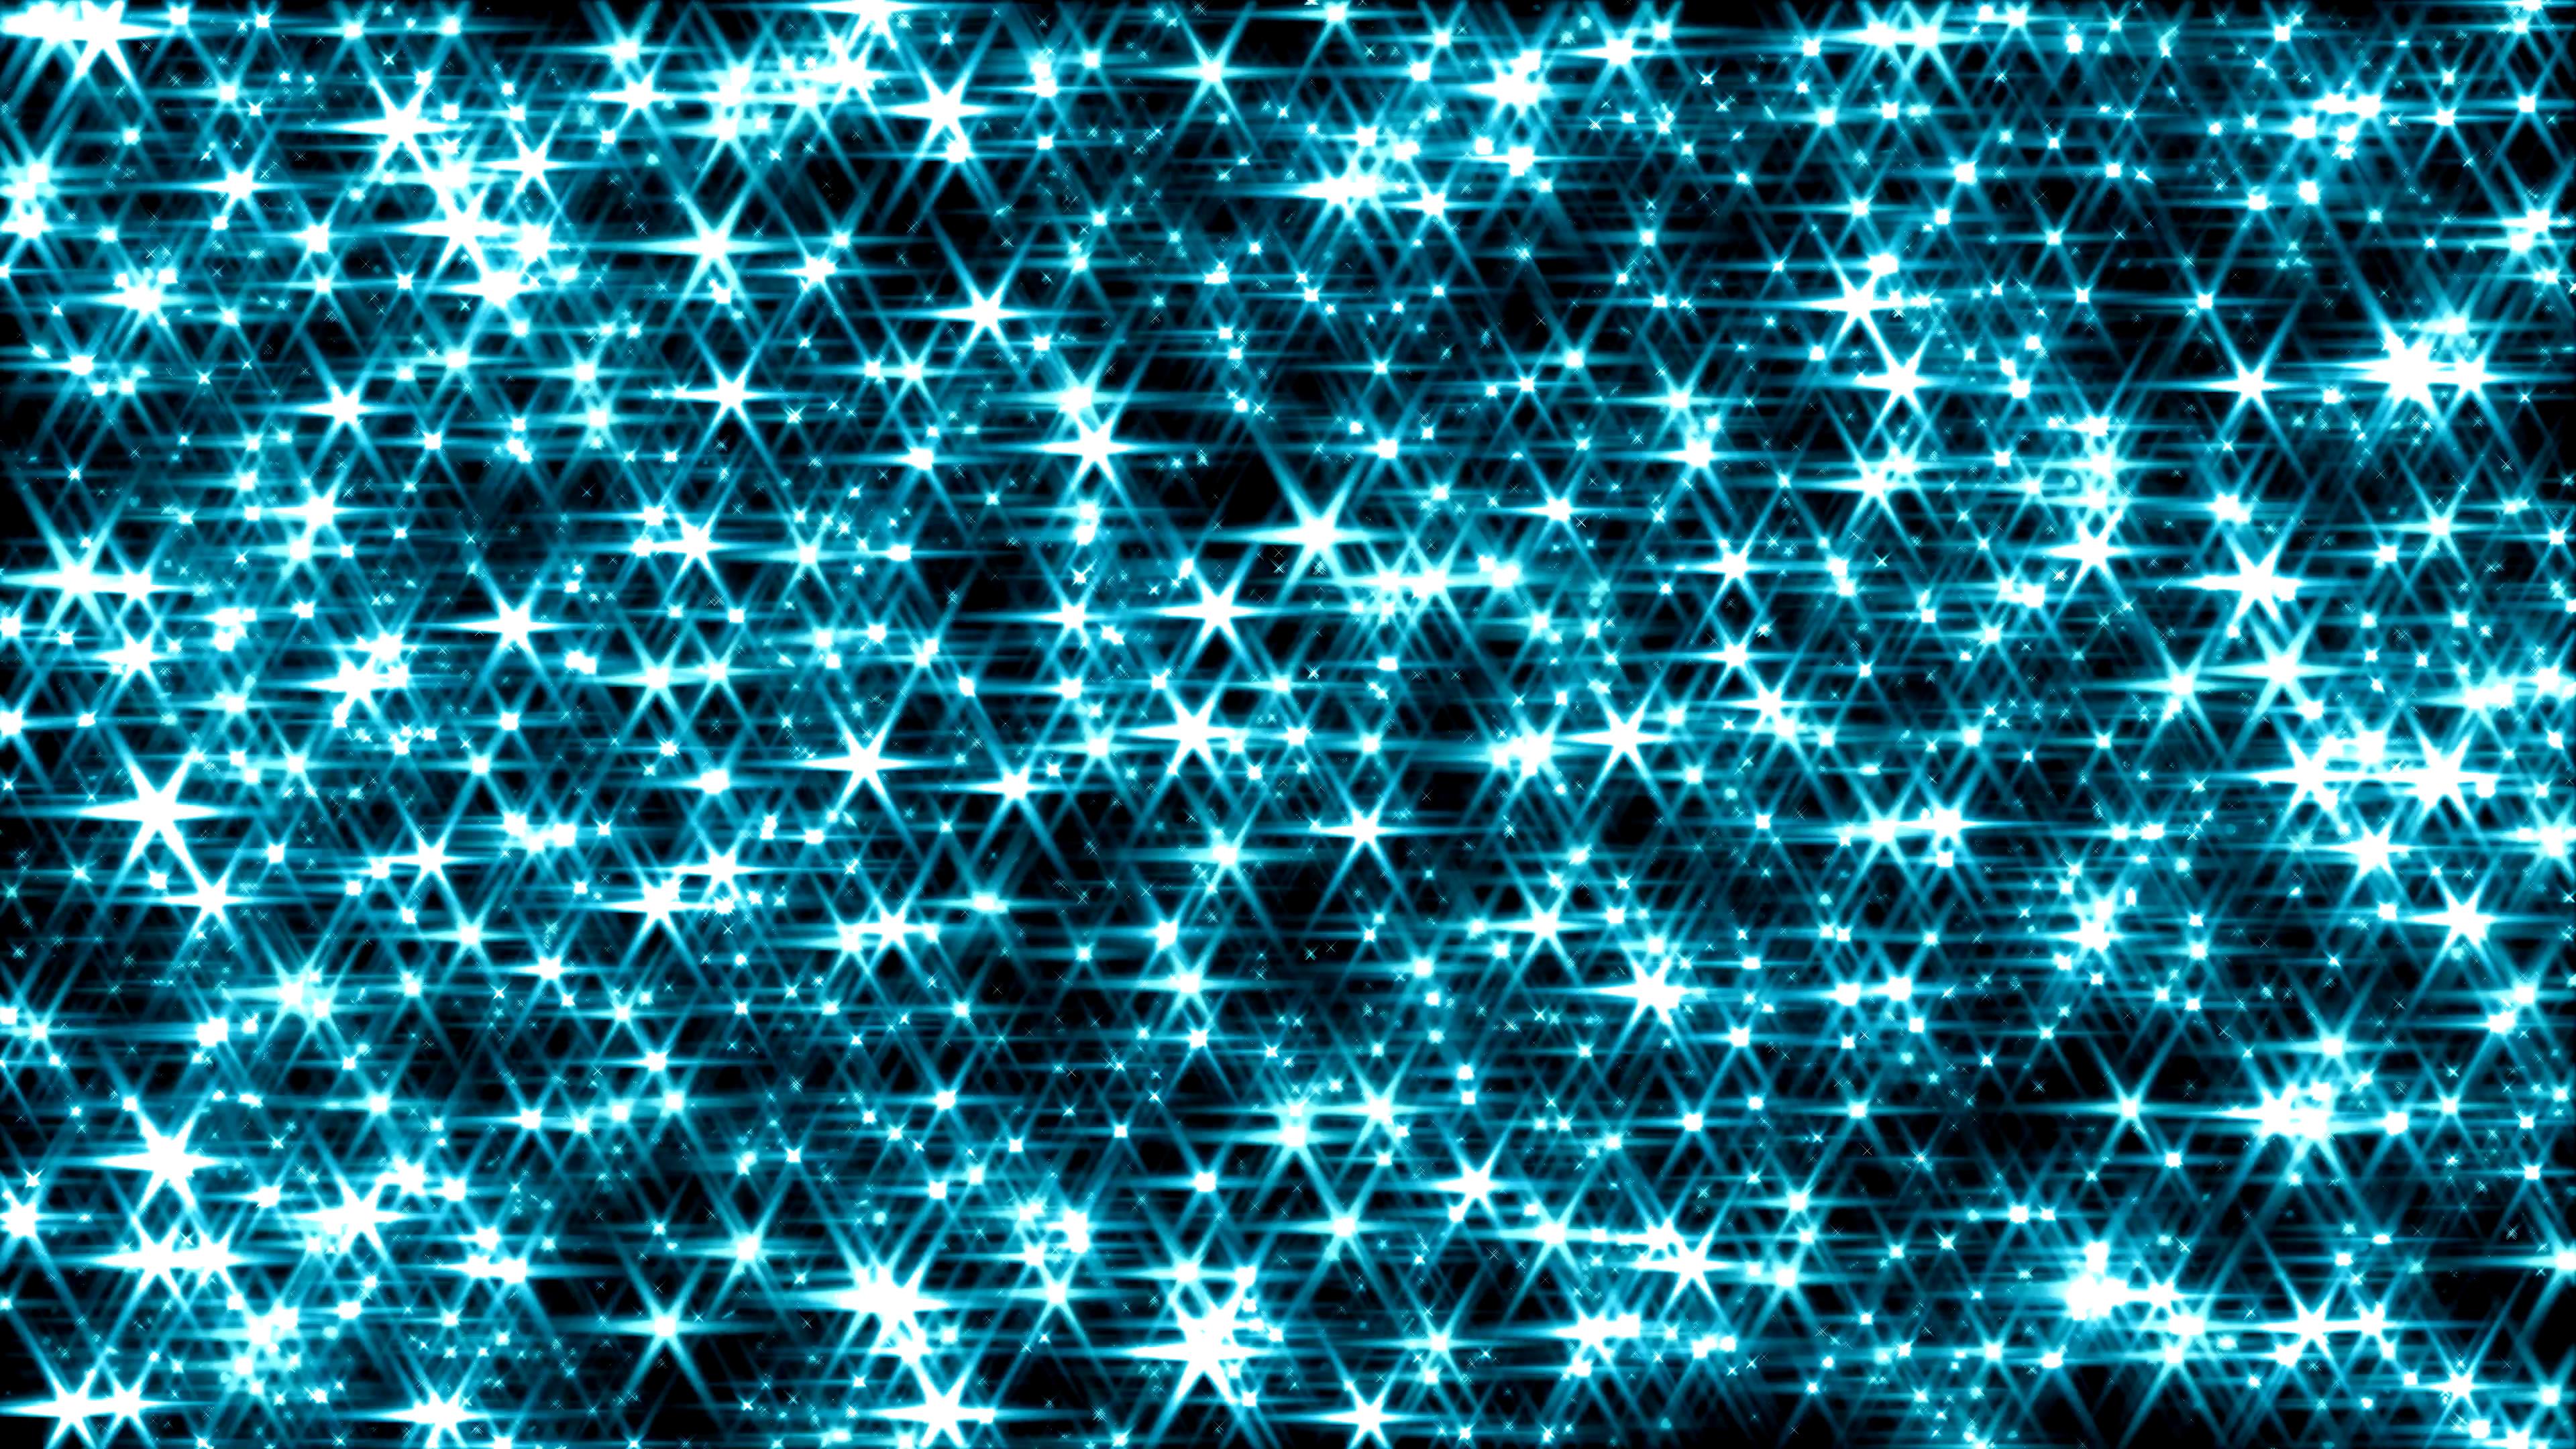 Falling Gold Sparkles Wallpaper Glitter Background Images 183 ① Wallpapertag